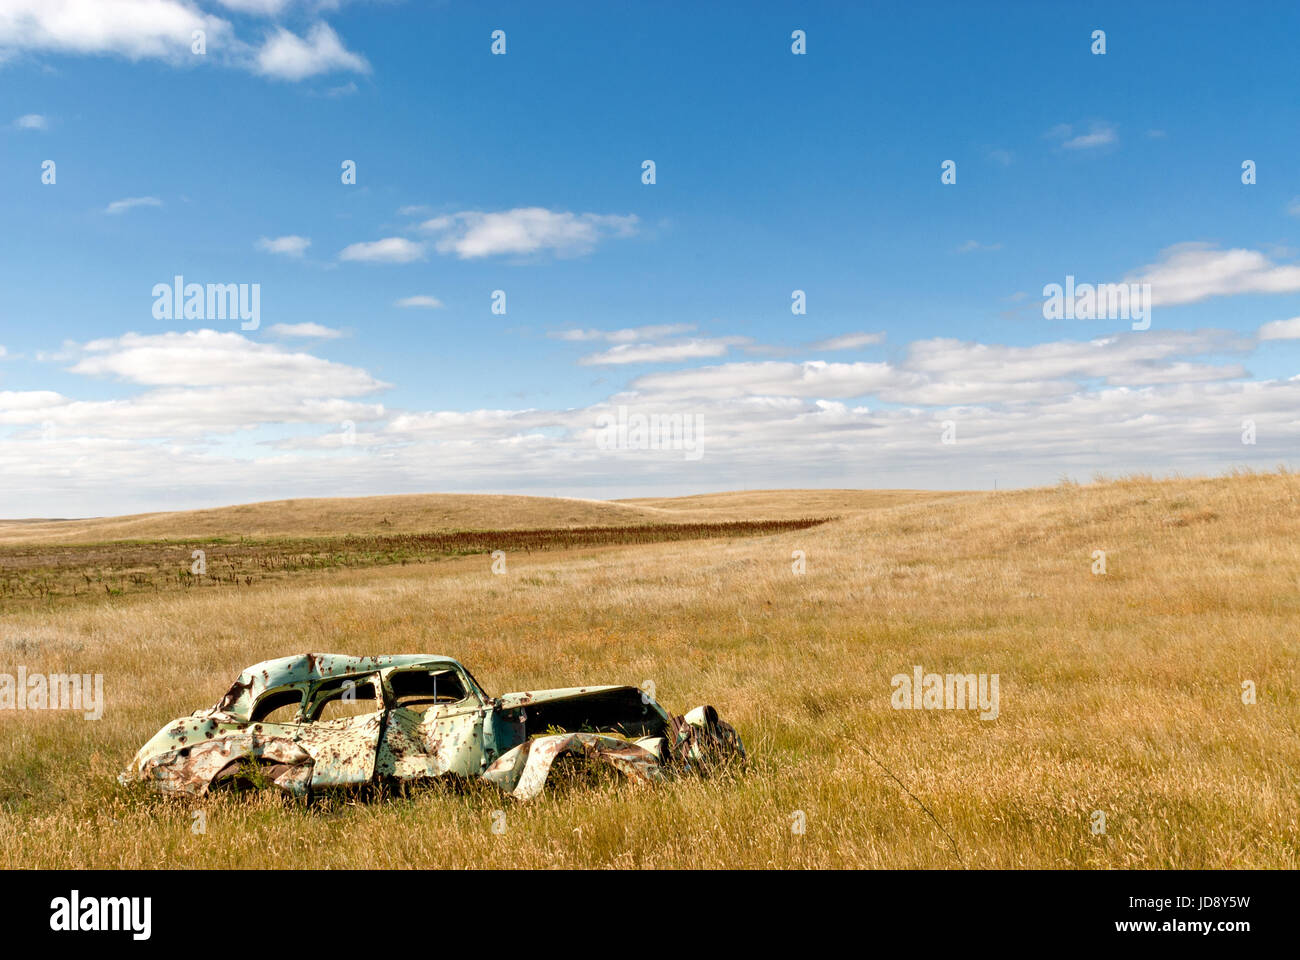 vintage car abandoned in prairie field - Stock Image